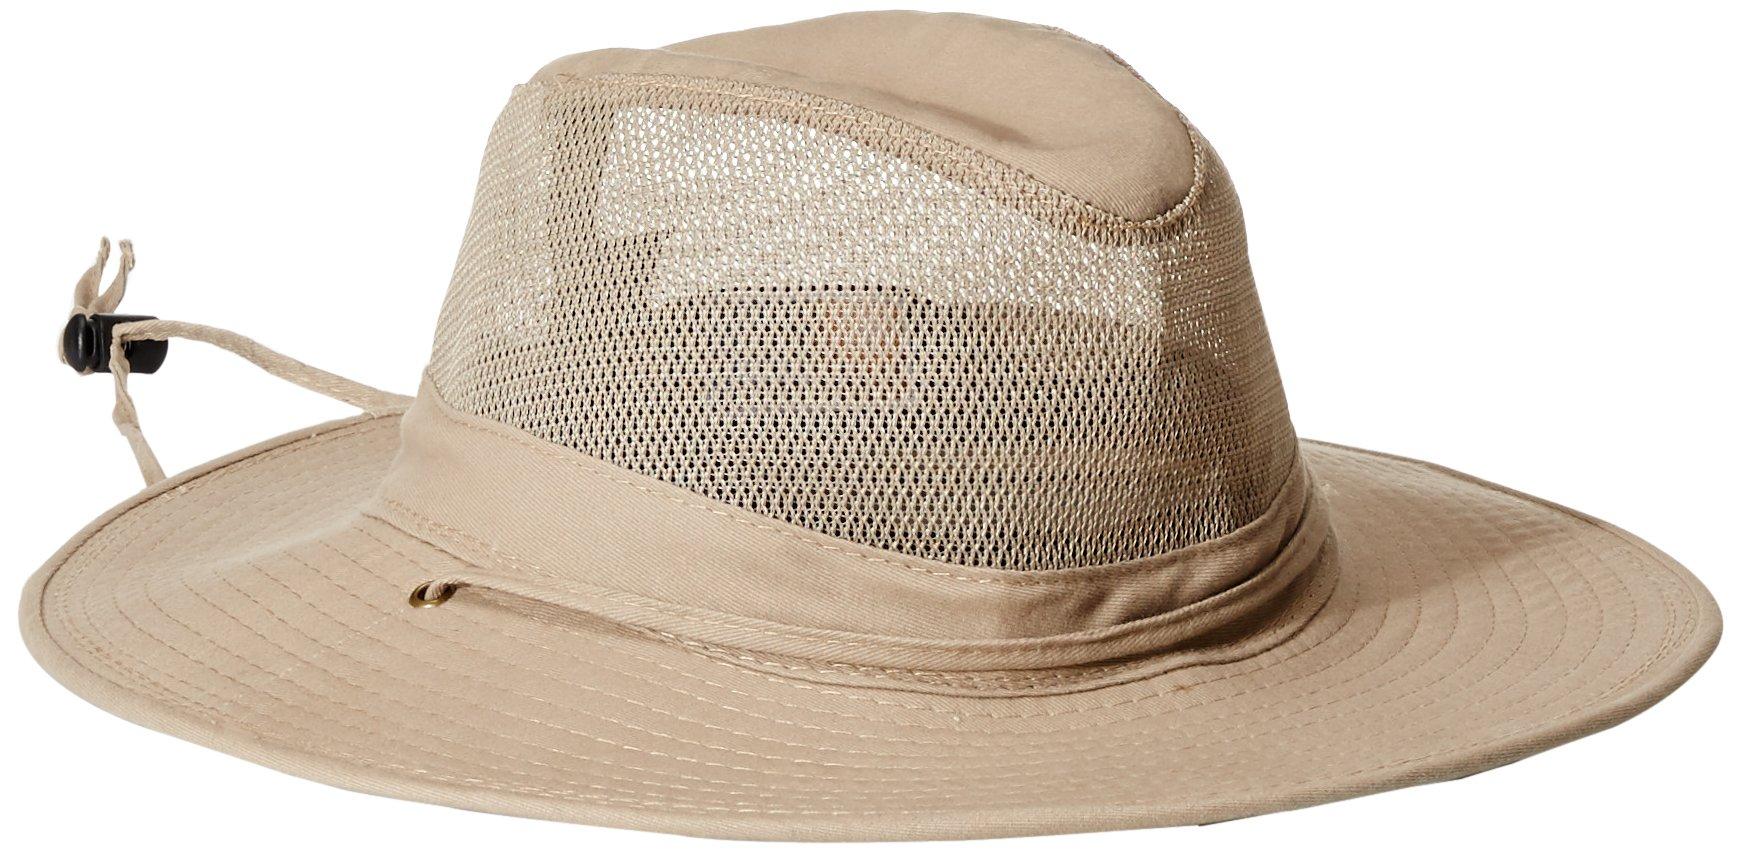 724256bbcdd19 Dorfman Pacific DPC Outdoors Solarweave Treated Cotton Hat